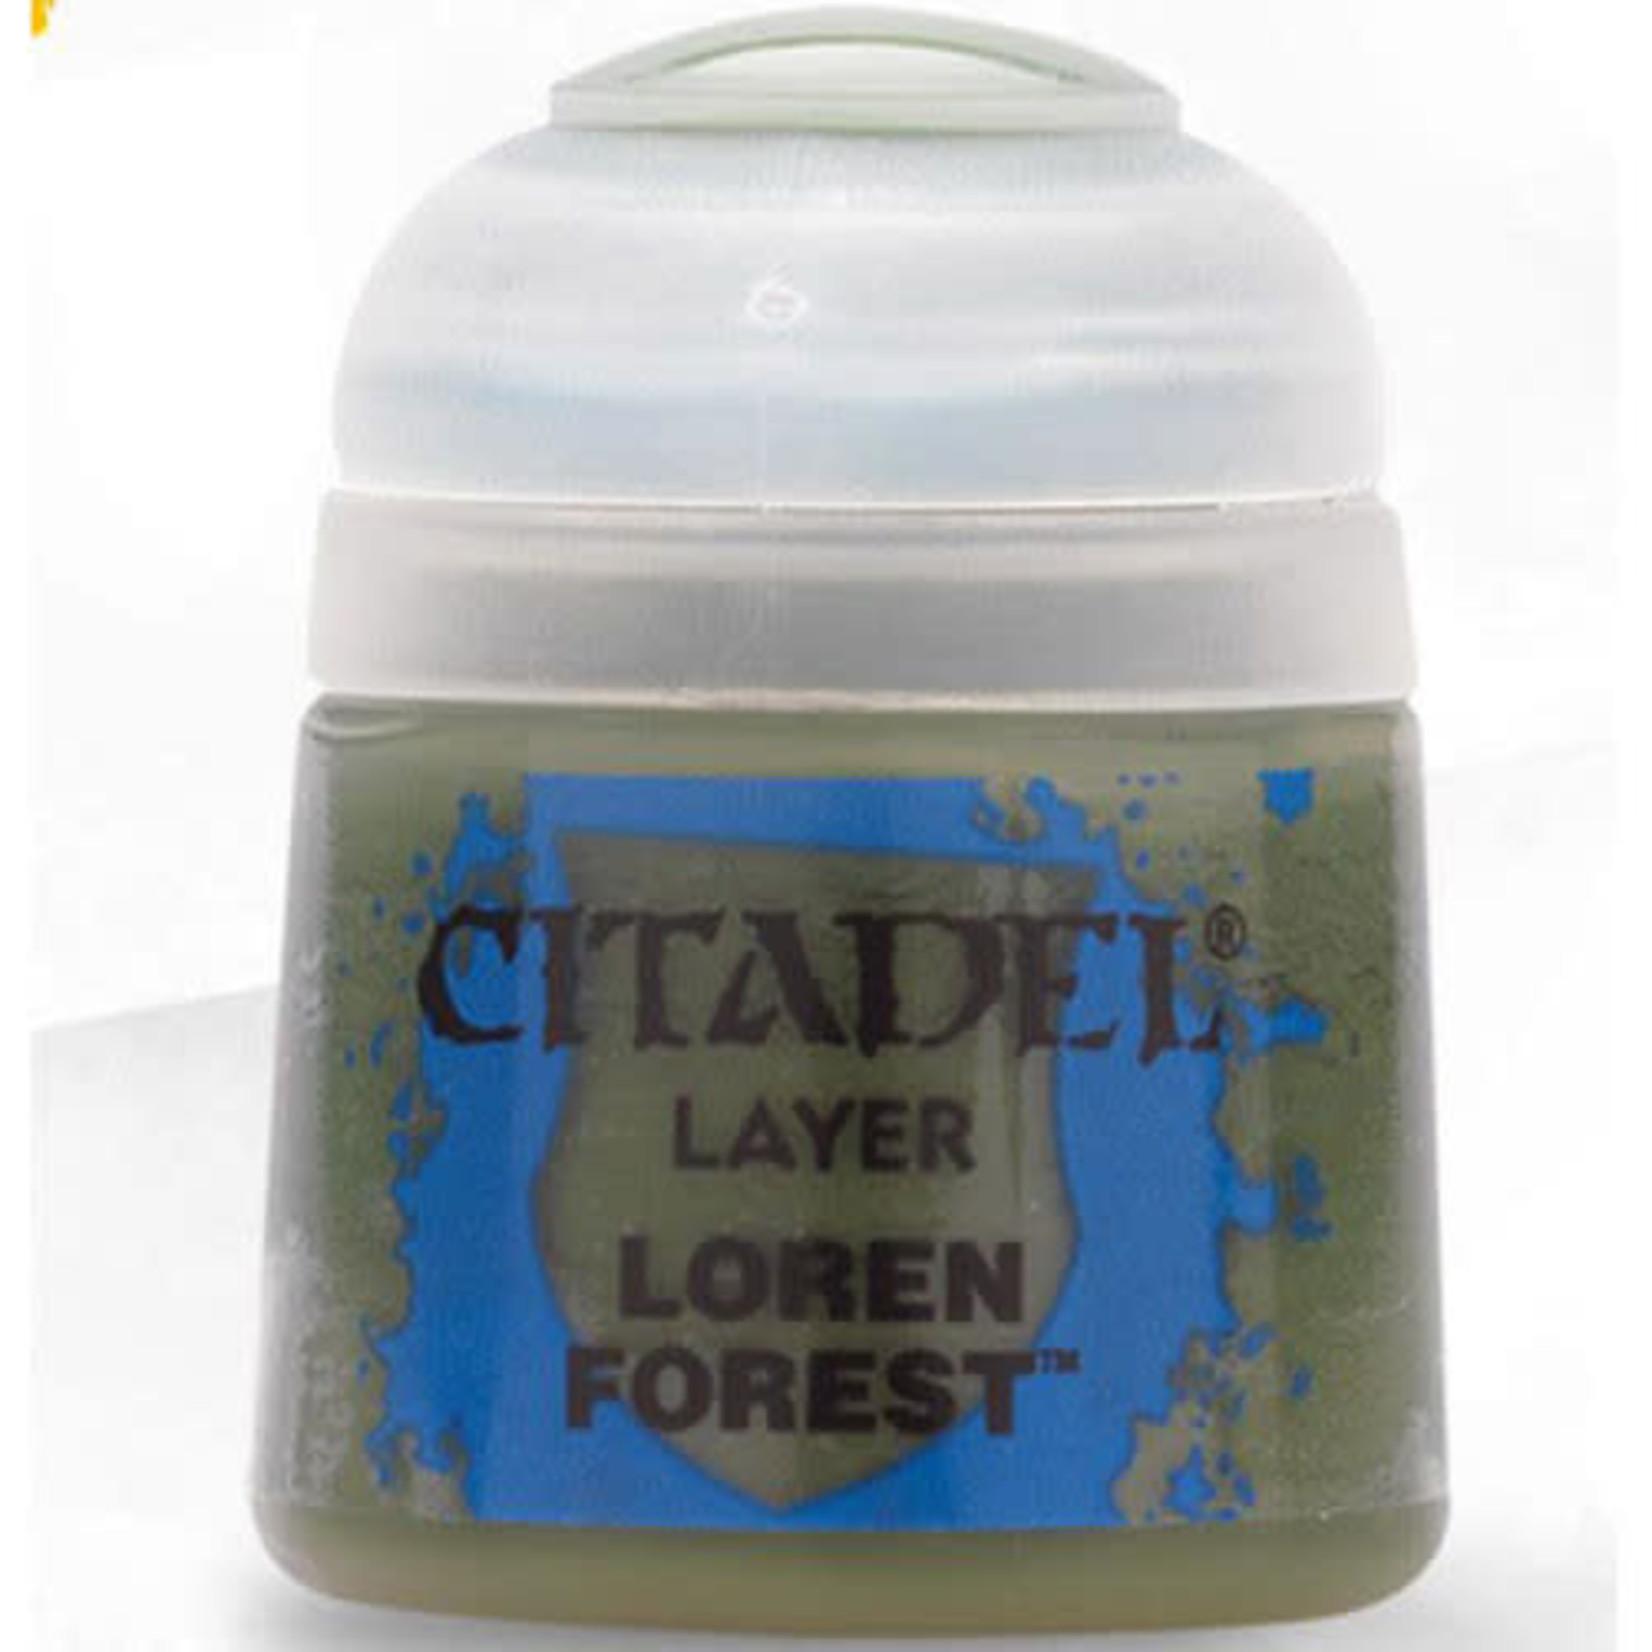 Games Workshop Citadel Paint: Loren Forest 12ml